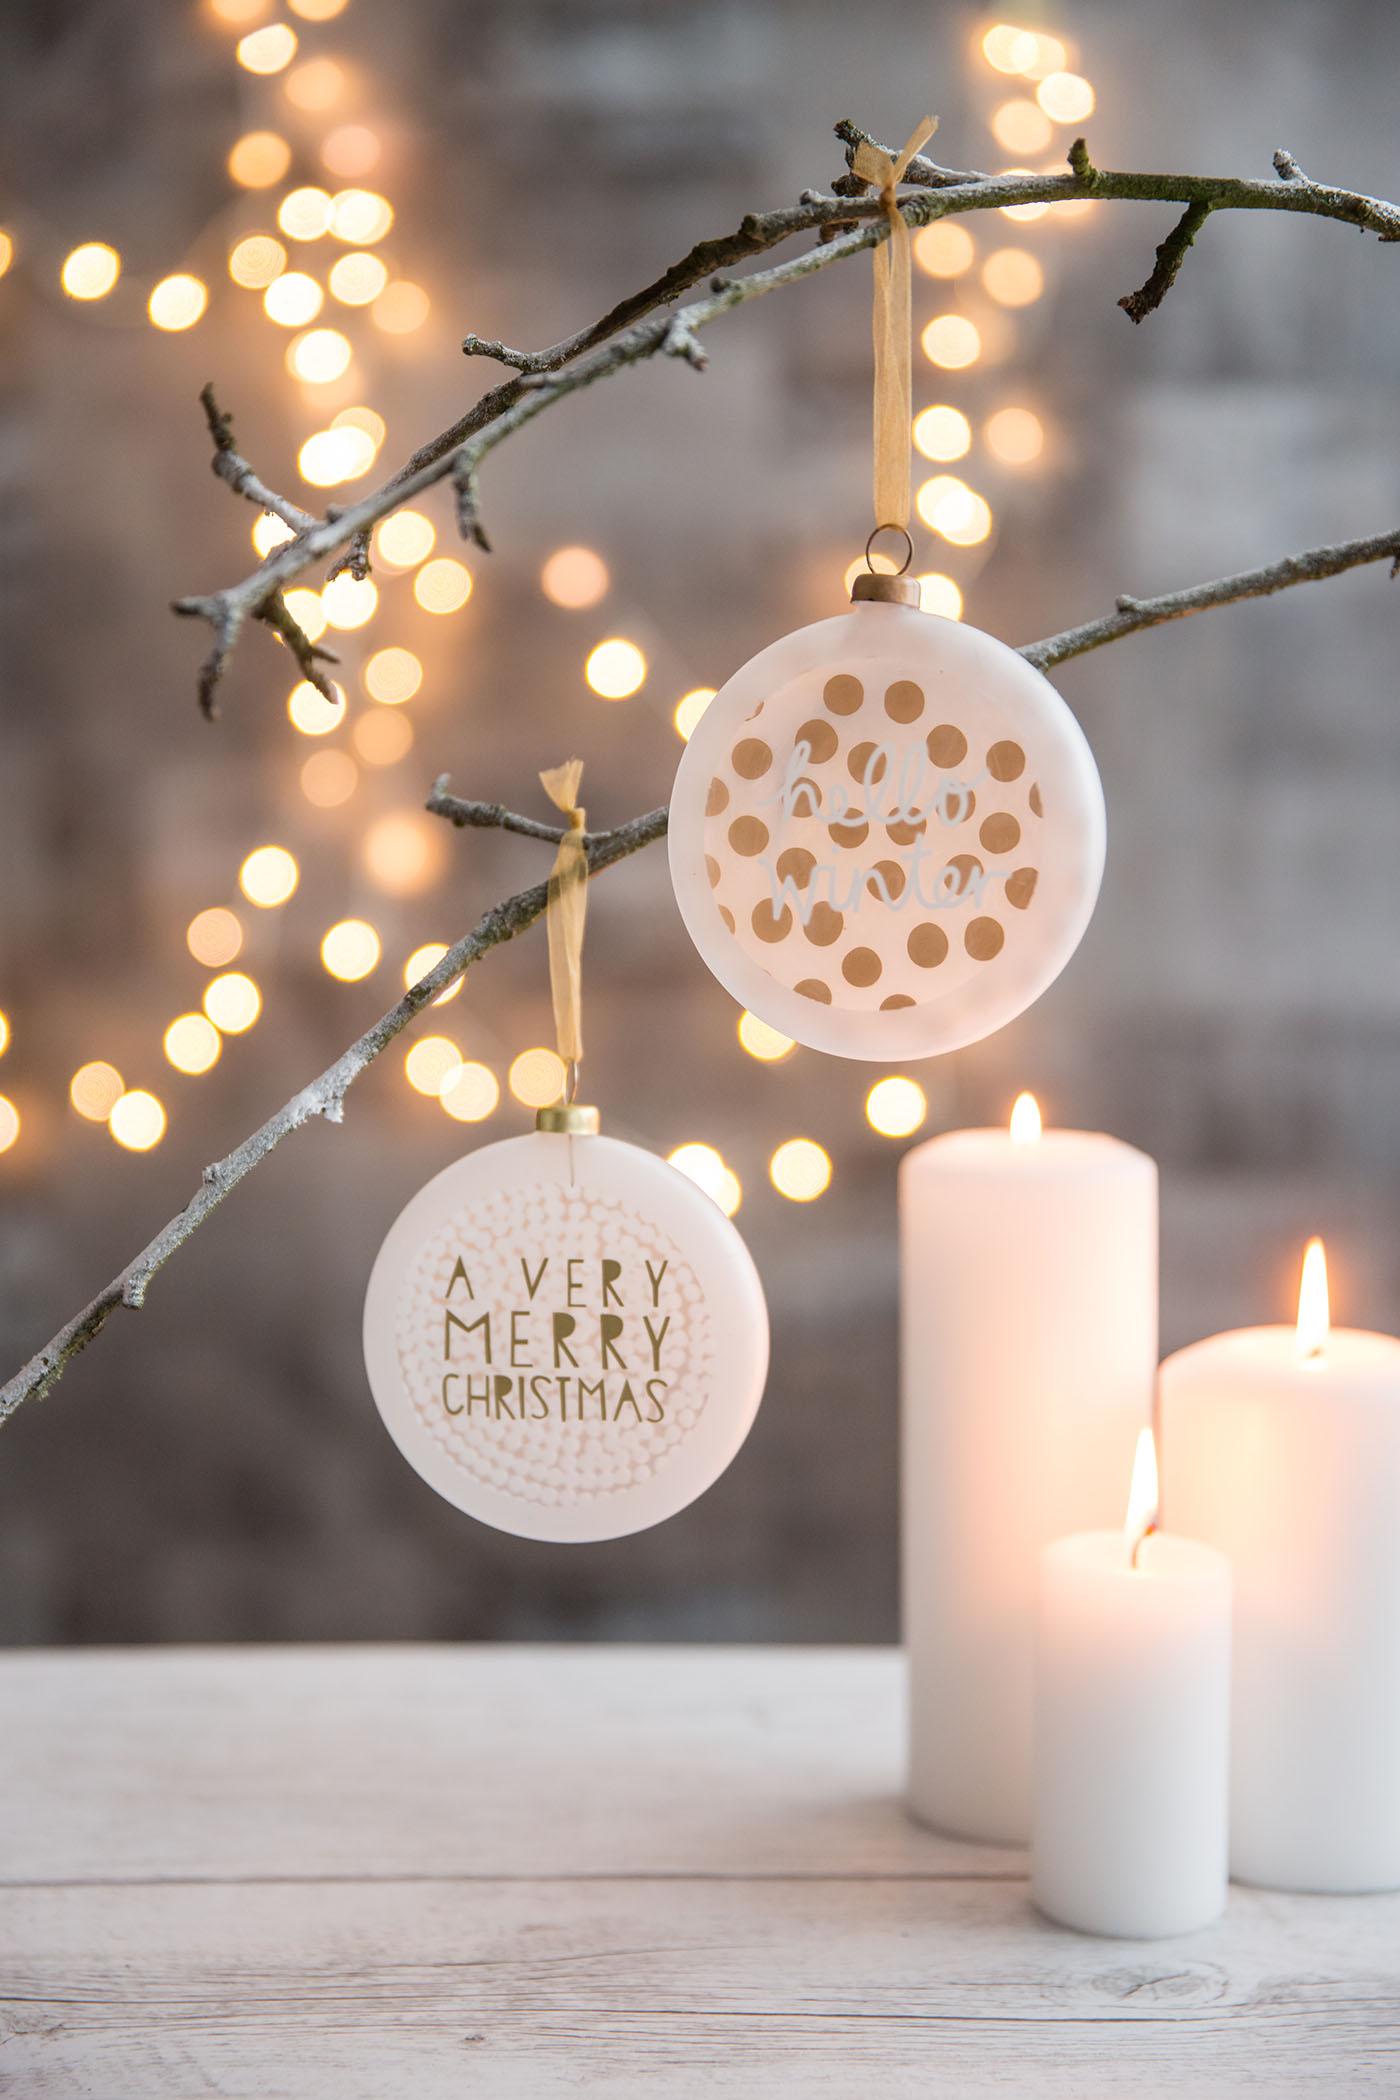 christbaum medaillon a very merry christmas von r der design. Black Bedroom Furniture Sets. Home Design Ideas